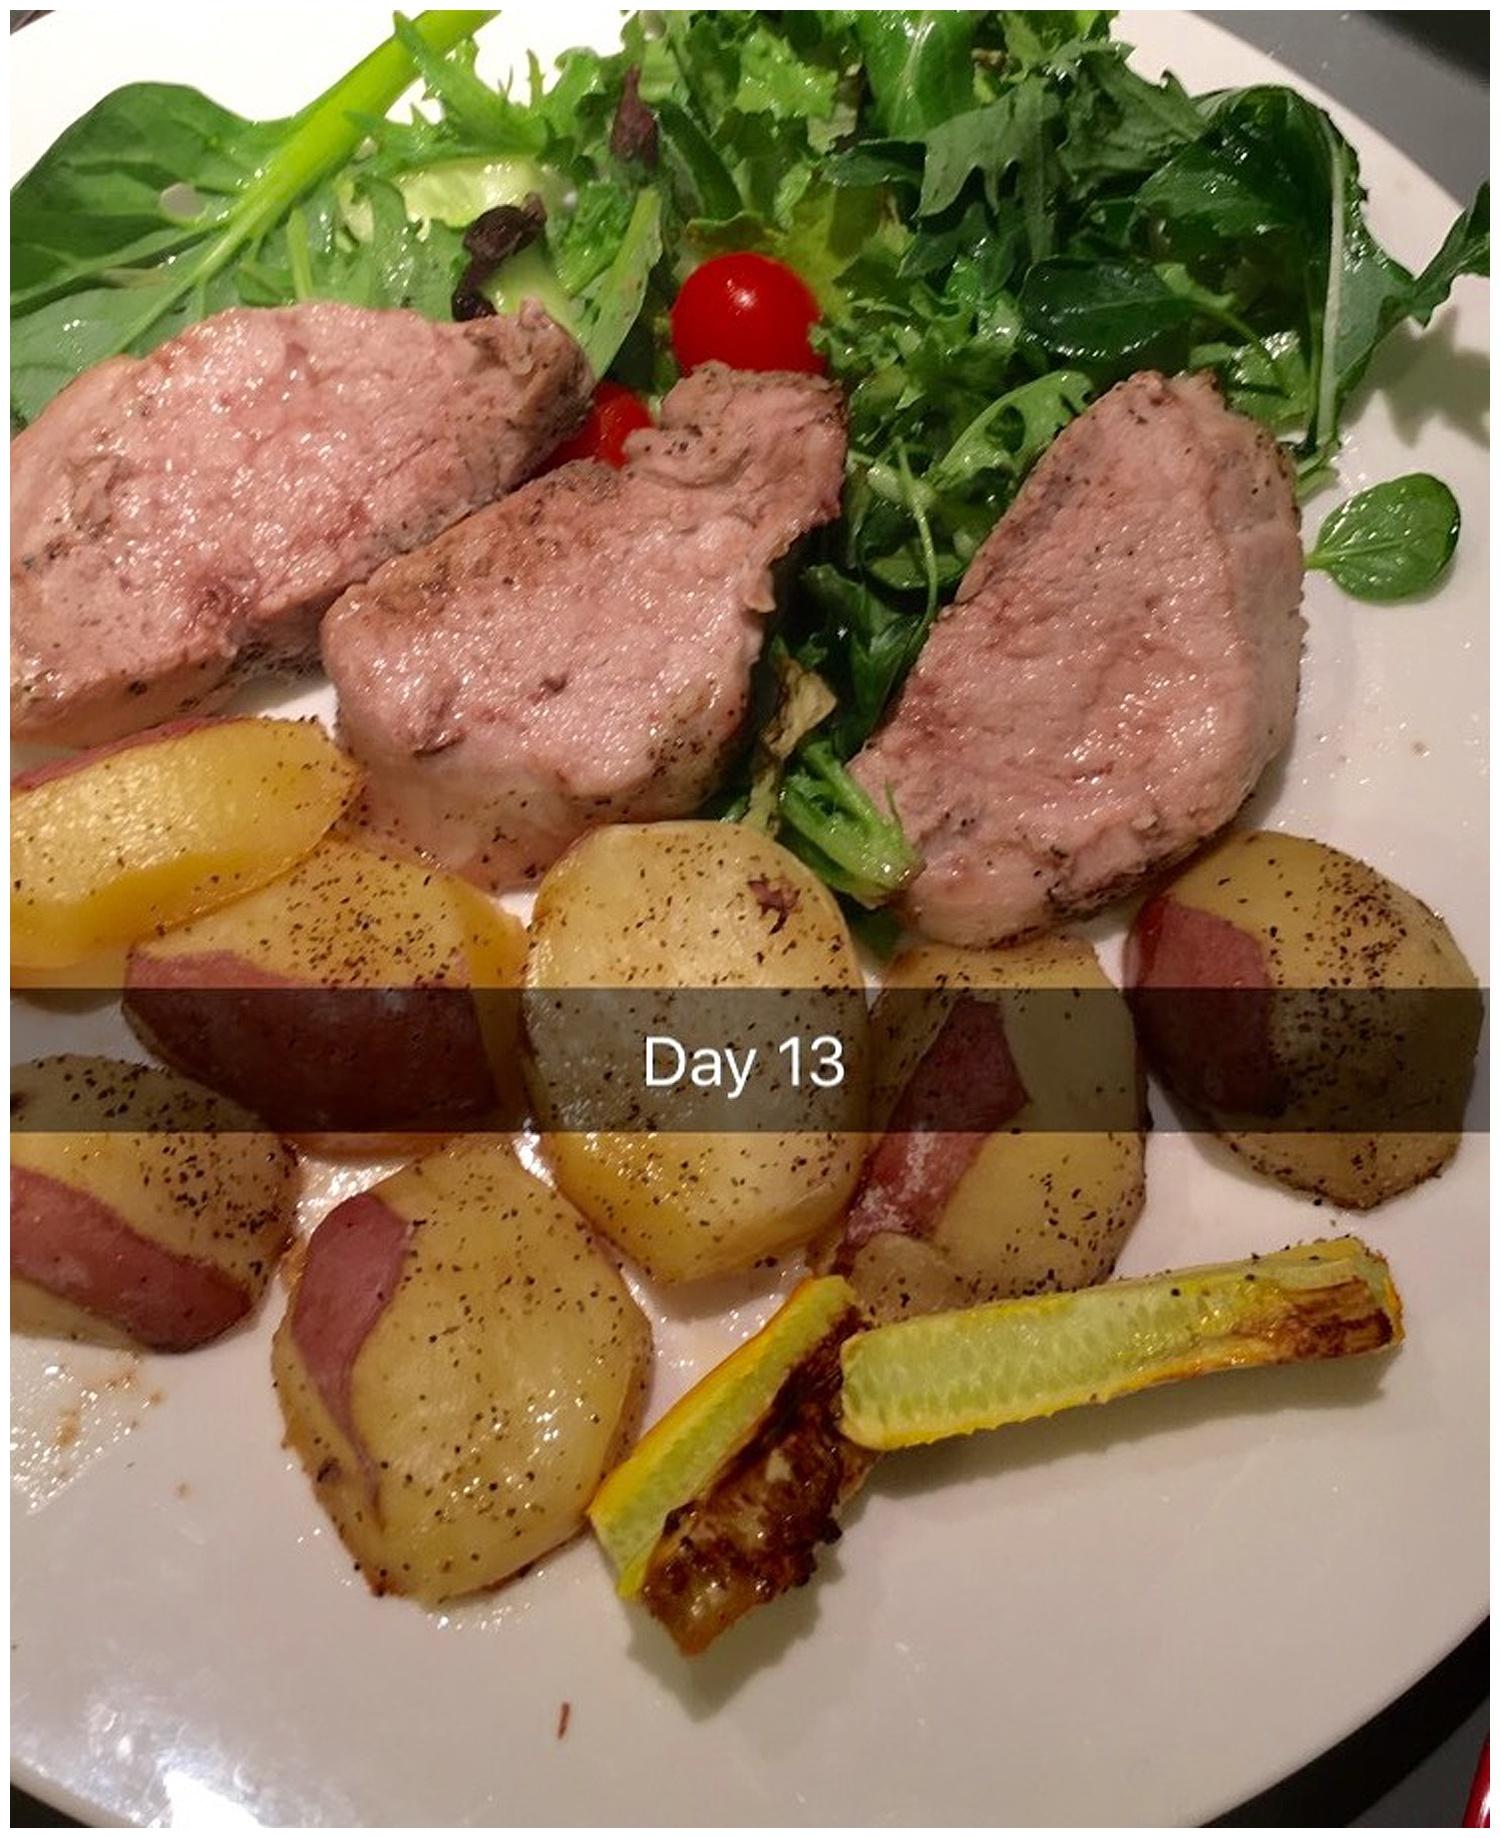 Pork with veggies